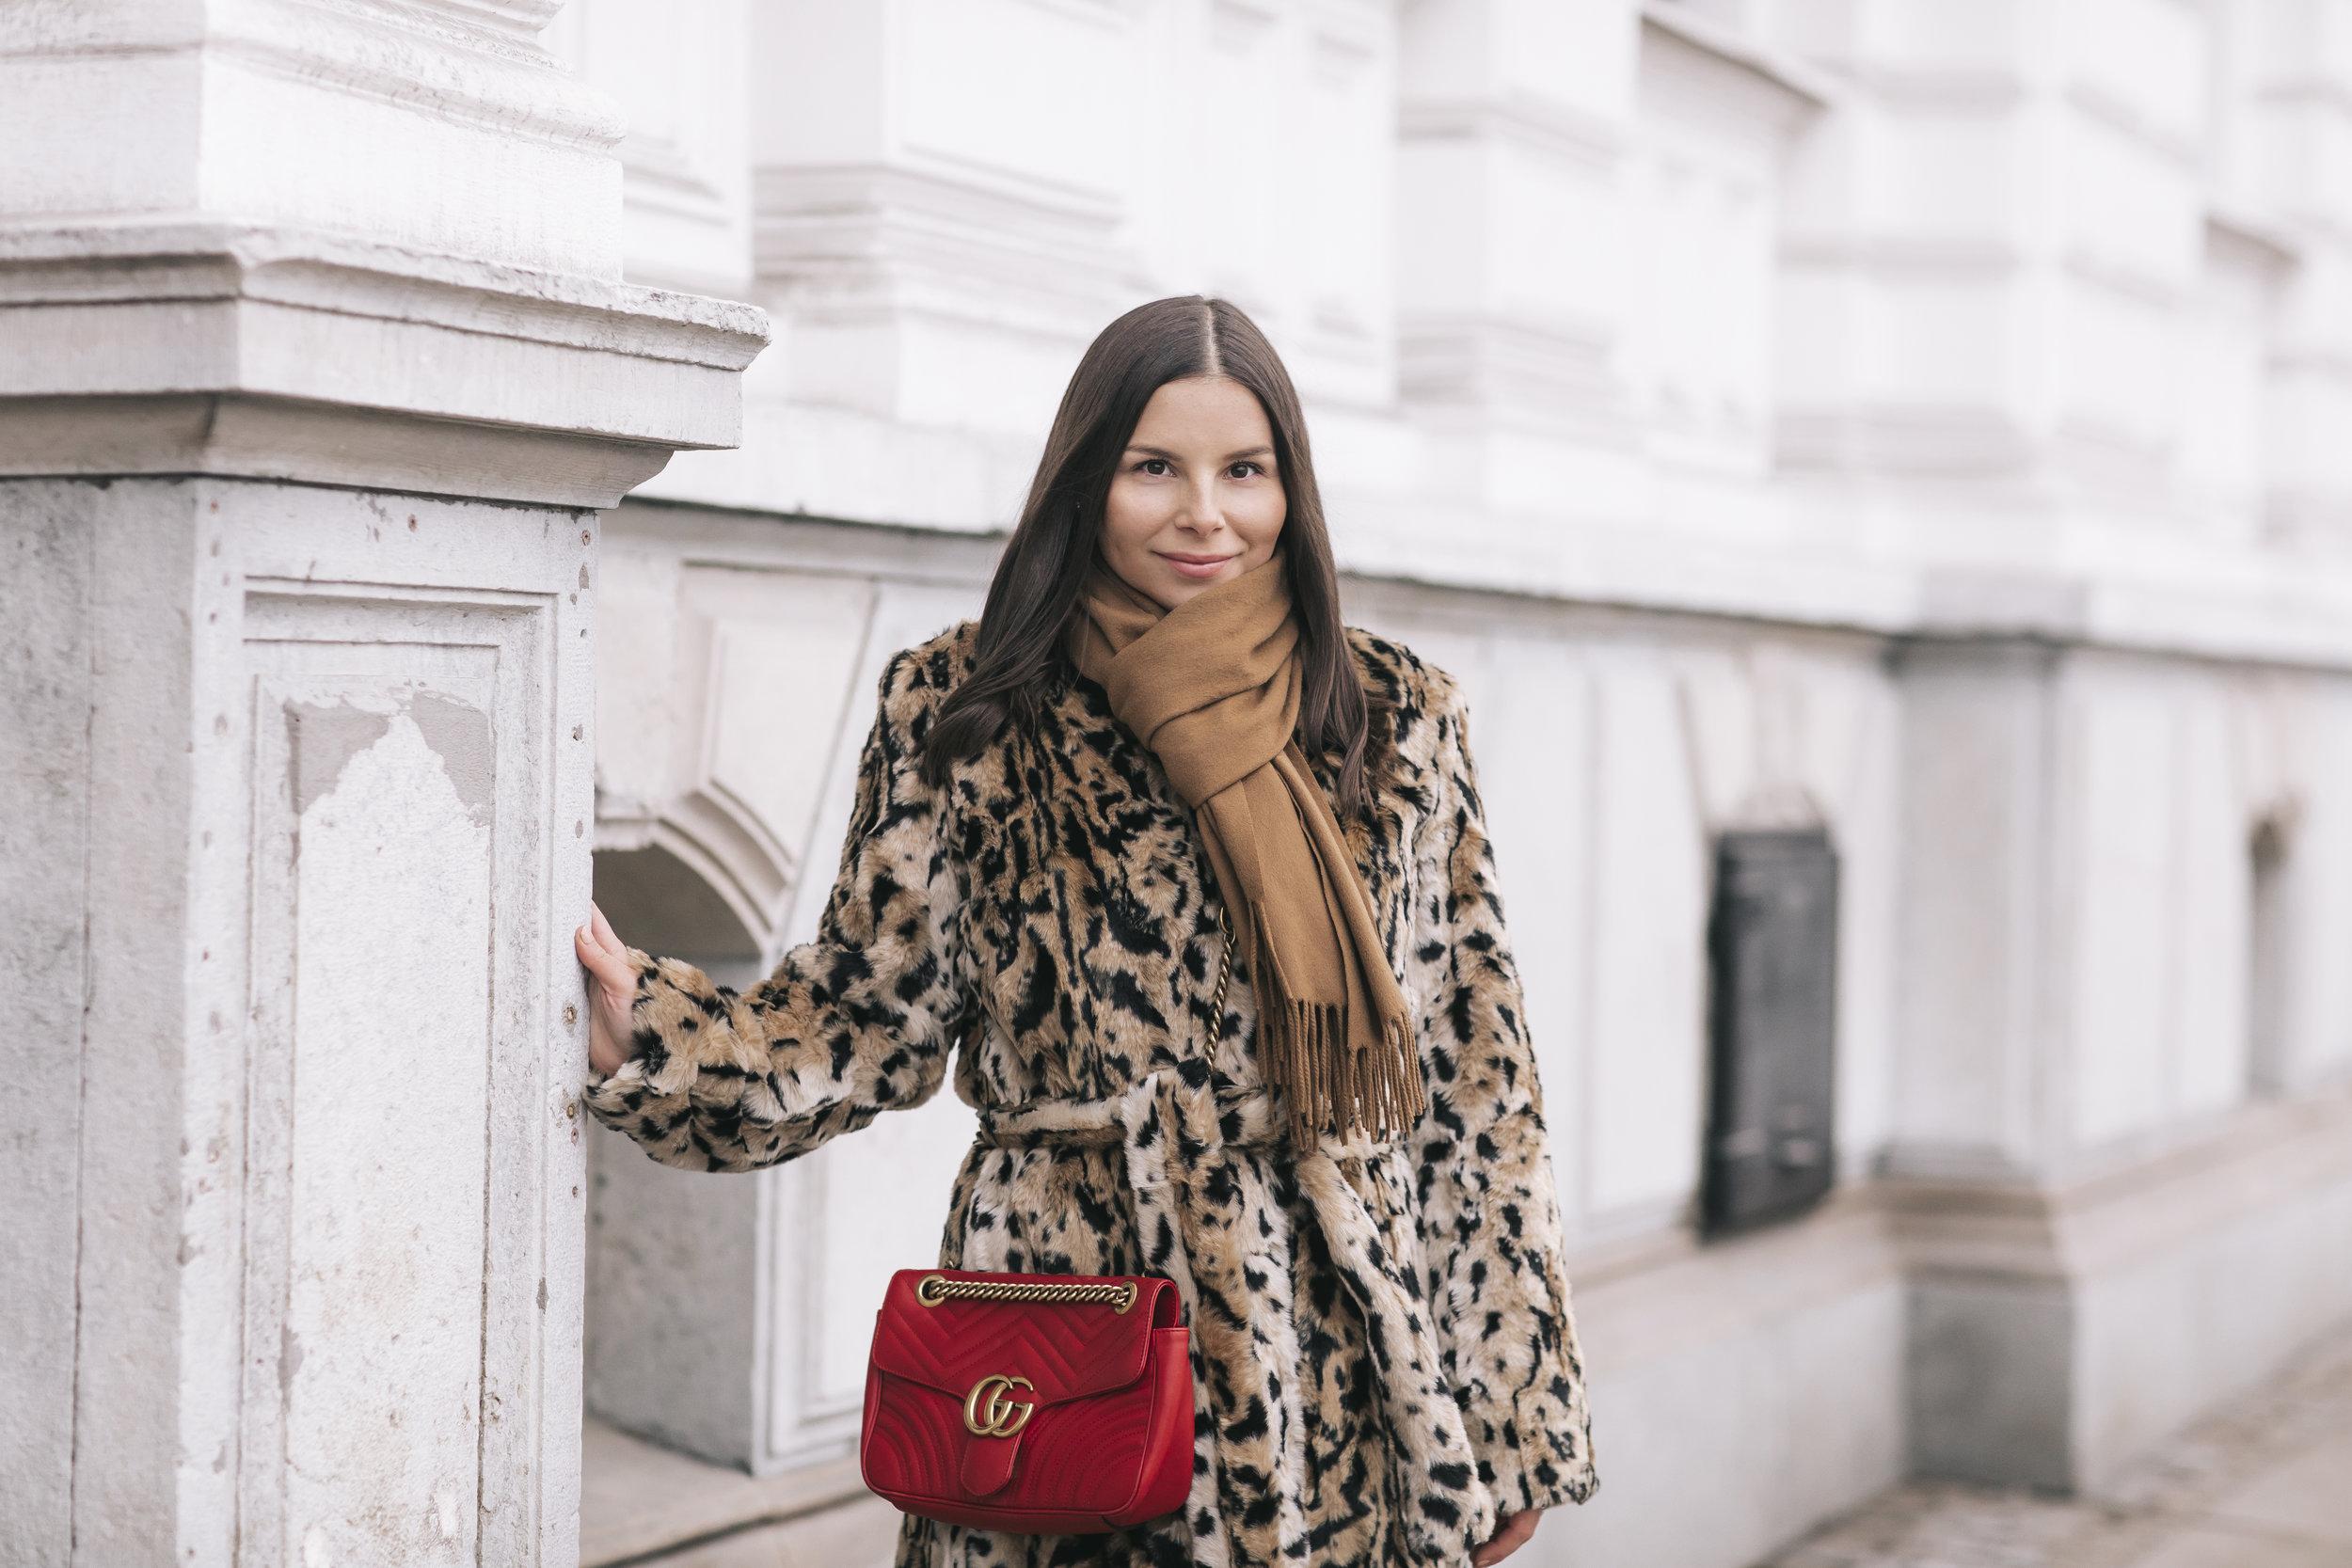 leopard fuskpals DAY Gucci Loro Piana.jpg